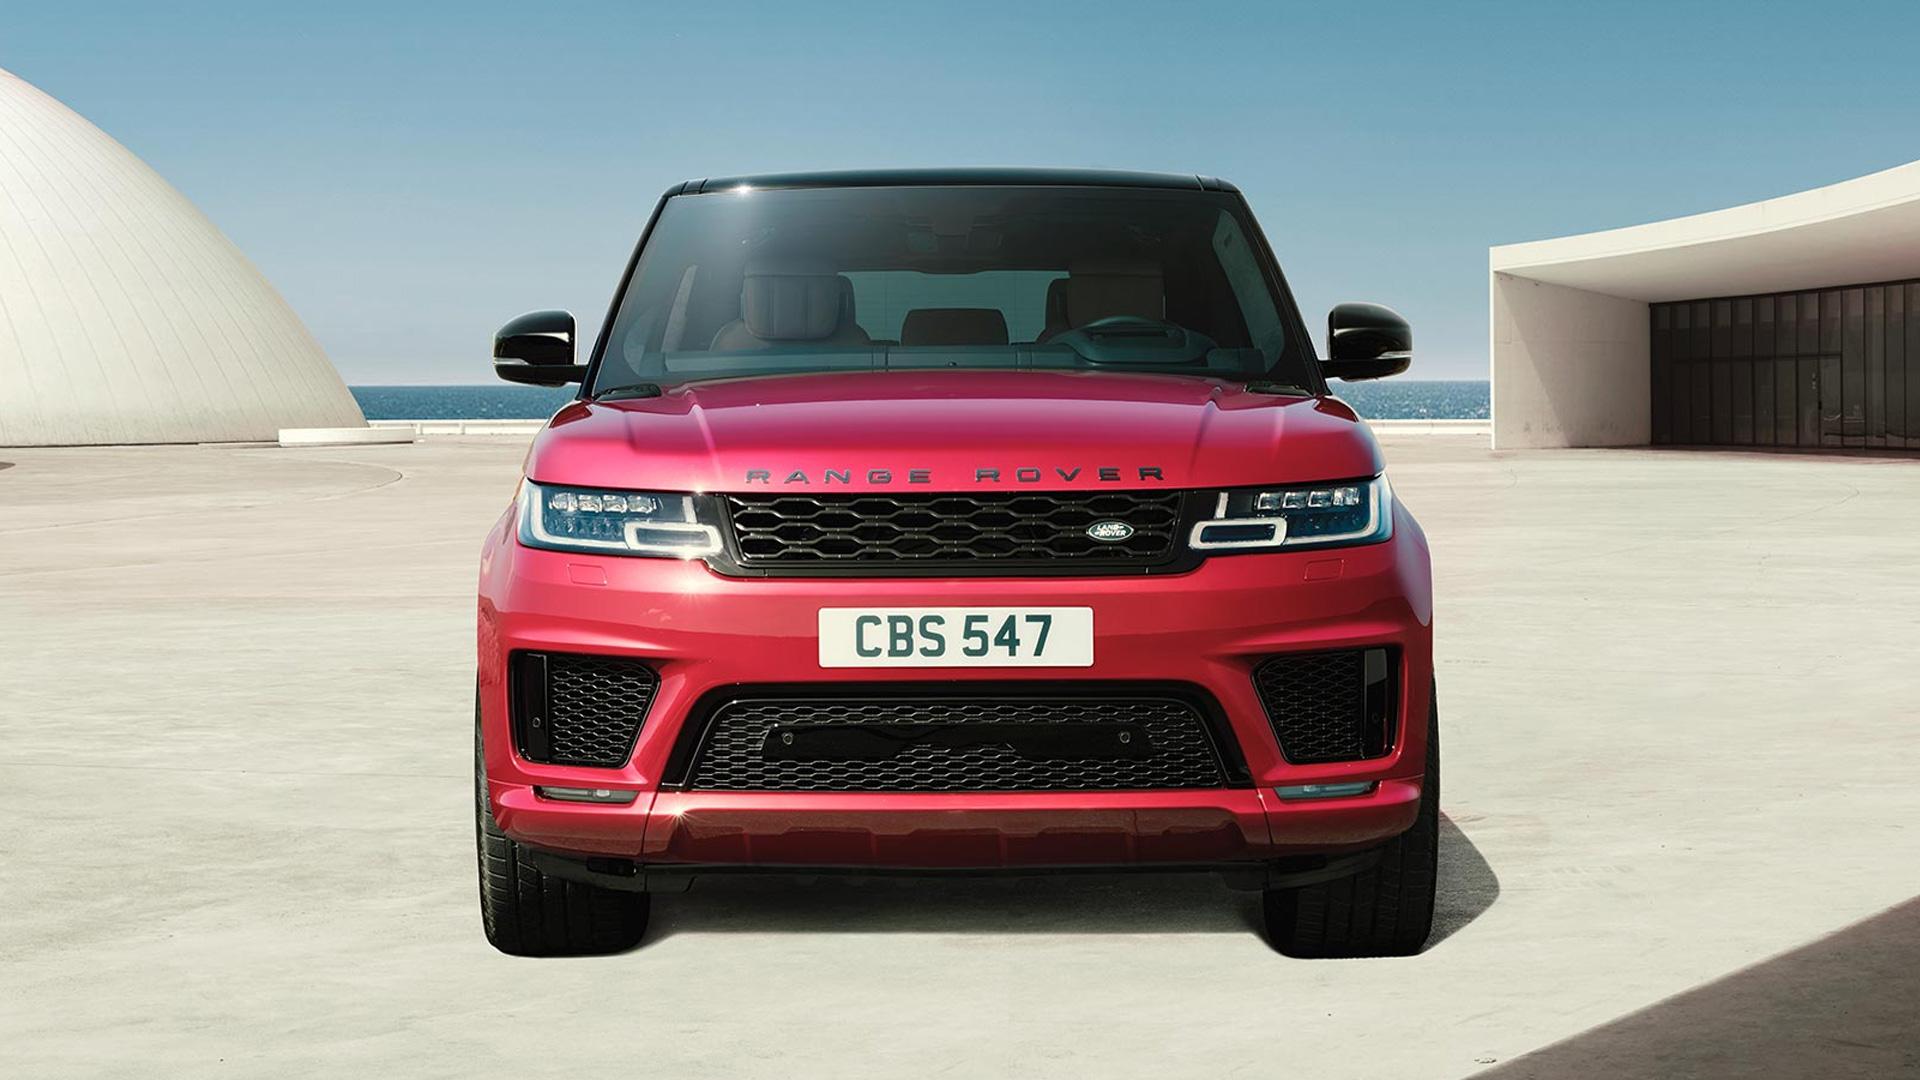 Land Rover Range Rover Sport 2018 5 0 l Petrol Autobiography Dynamic